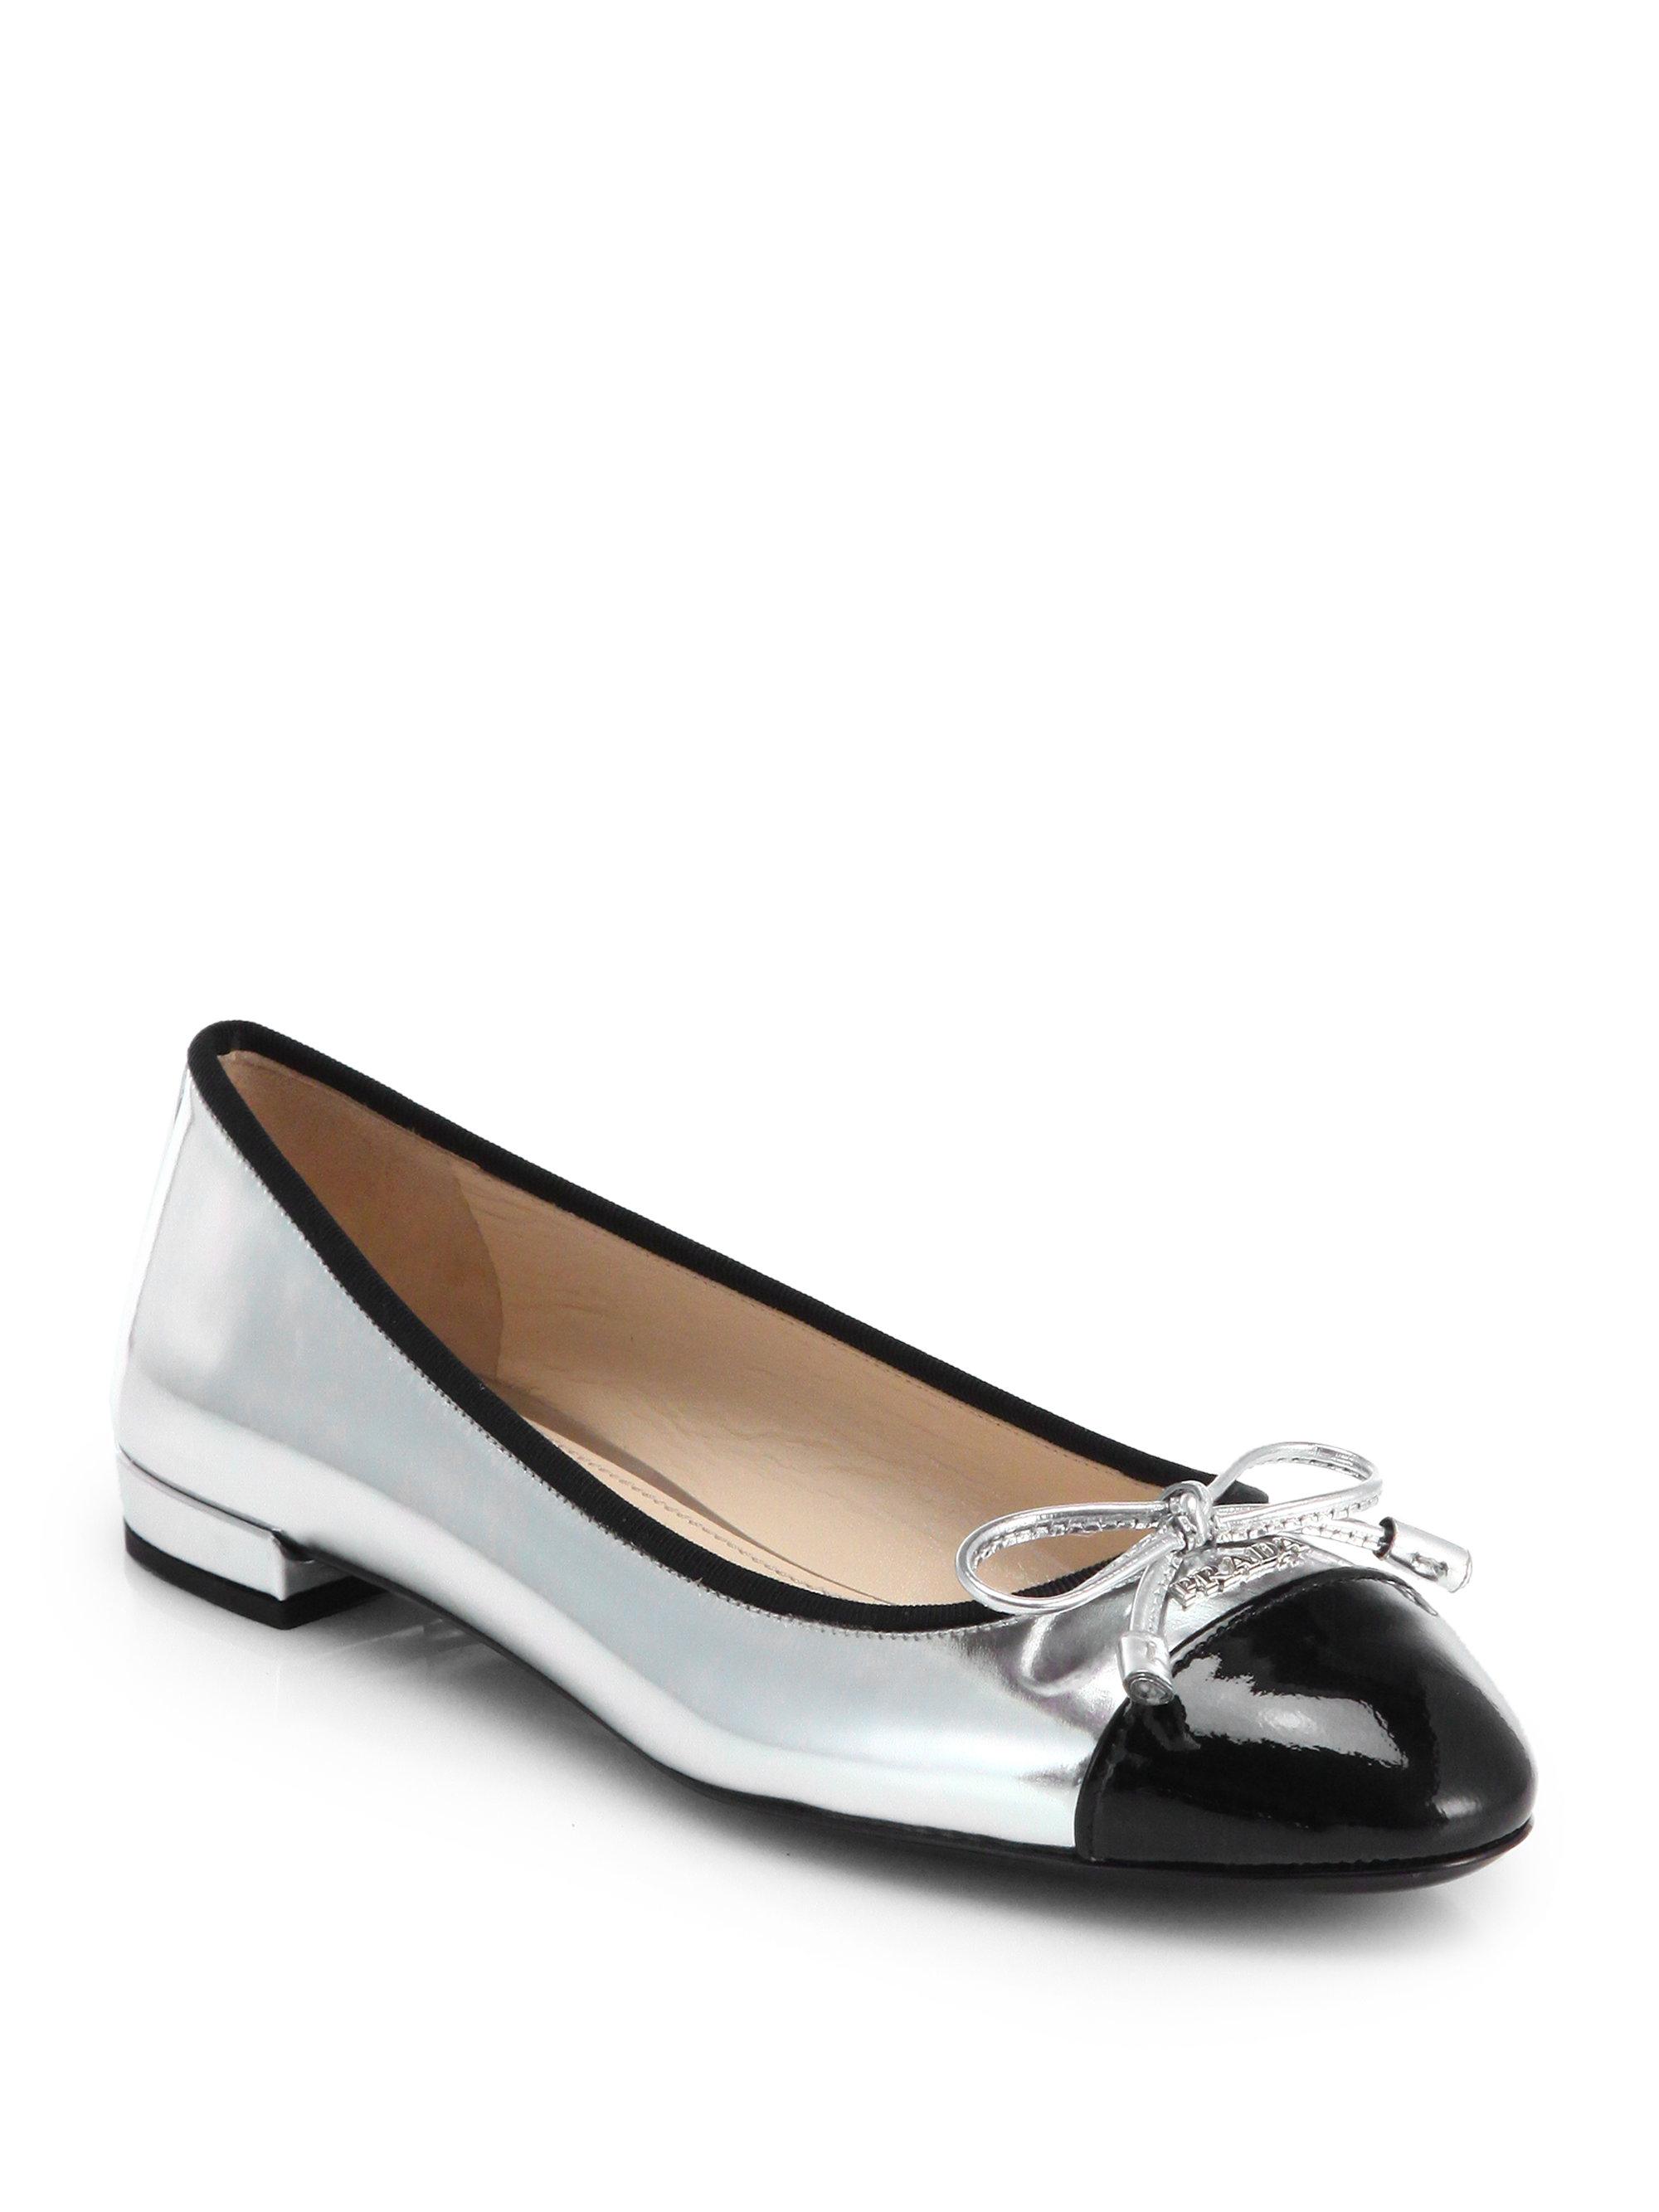 Prada Metallic Leather Cap-Toe Ballet Flats in Silver ...